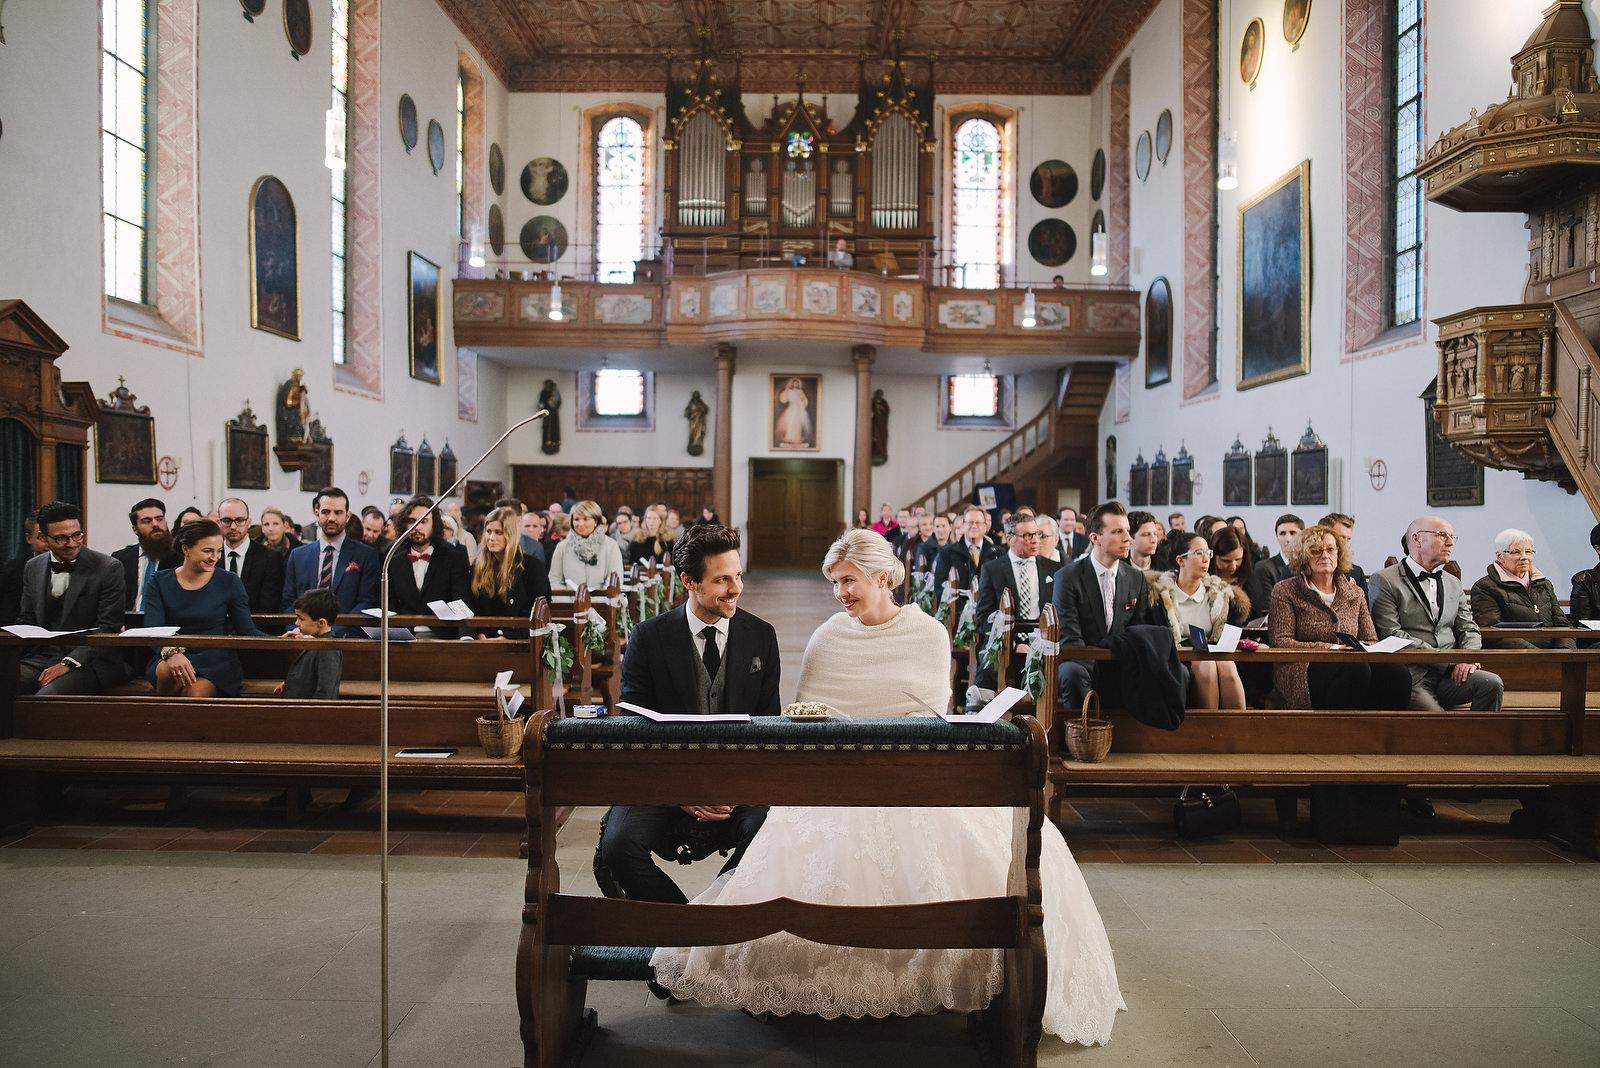 Fotograf Konstanz - Silvester Wedding in Hagnau / Friedrichshafen at Lake of Constance  - 18 -